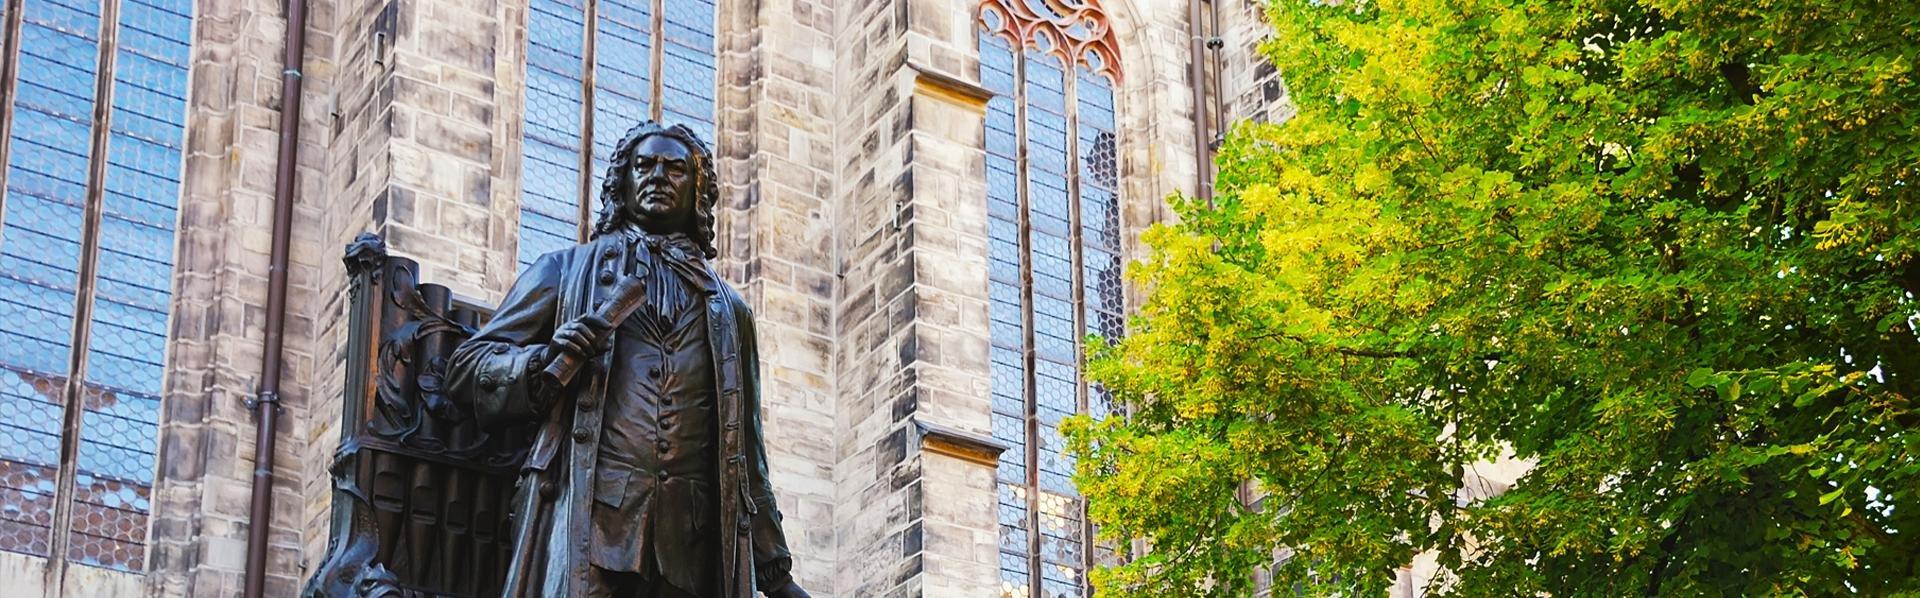 Standbeeld van Bach voor Thomaskirche in Leipzig, Duitsland